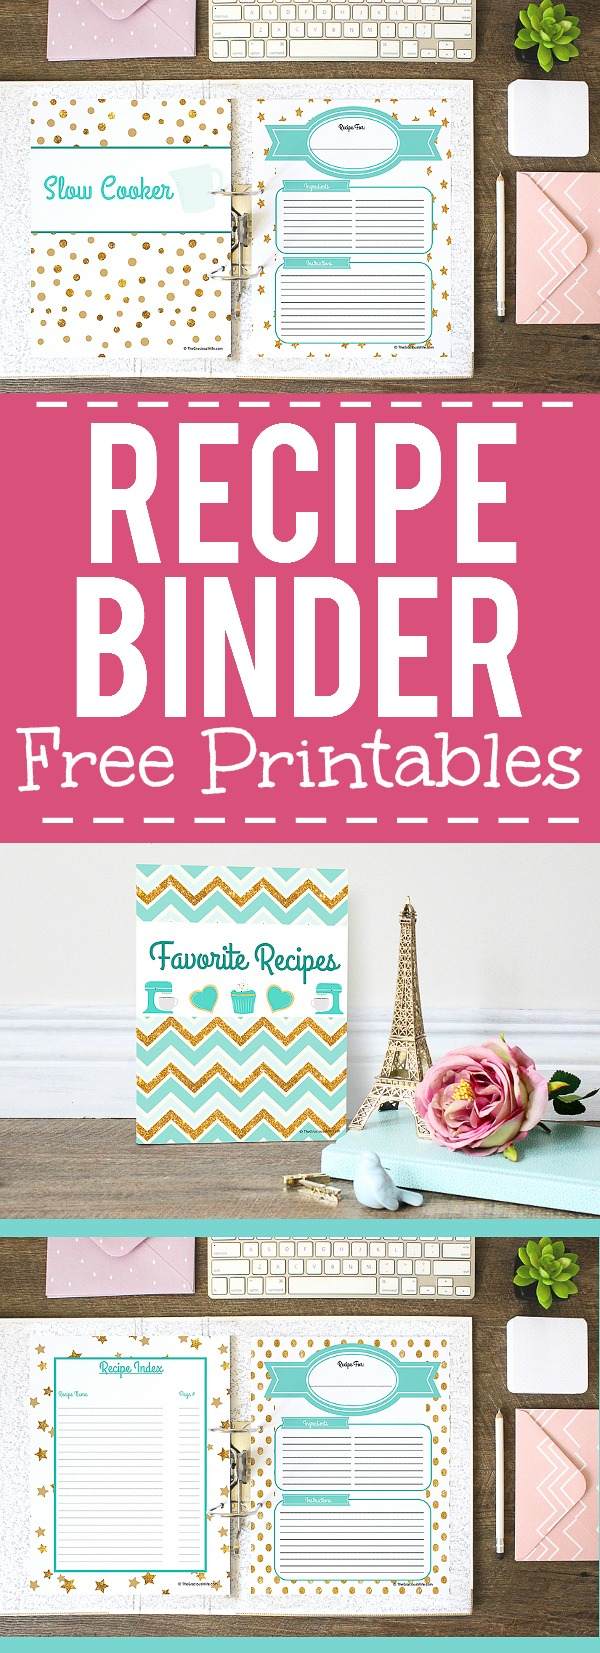 How To Make A Recipe Binder | Free Recipe Binder Printables - Free Printable Recipe Binder